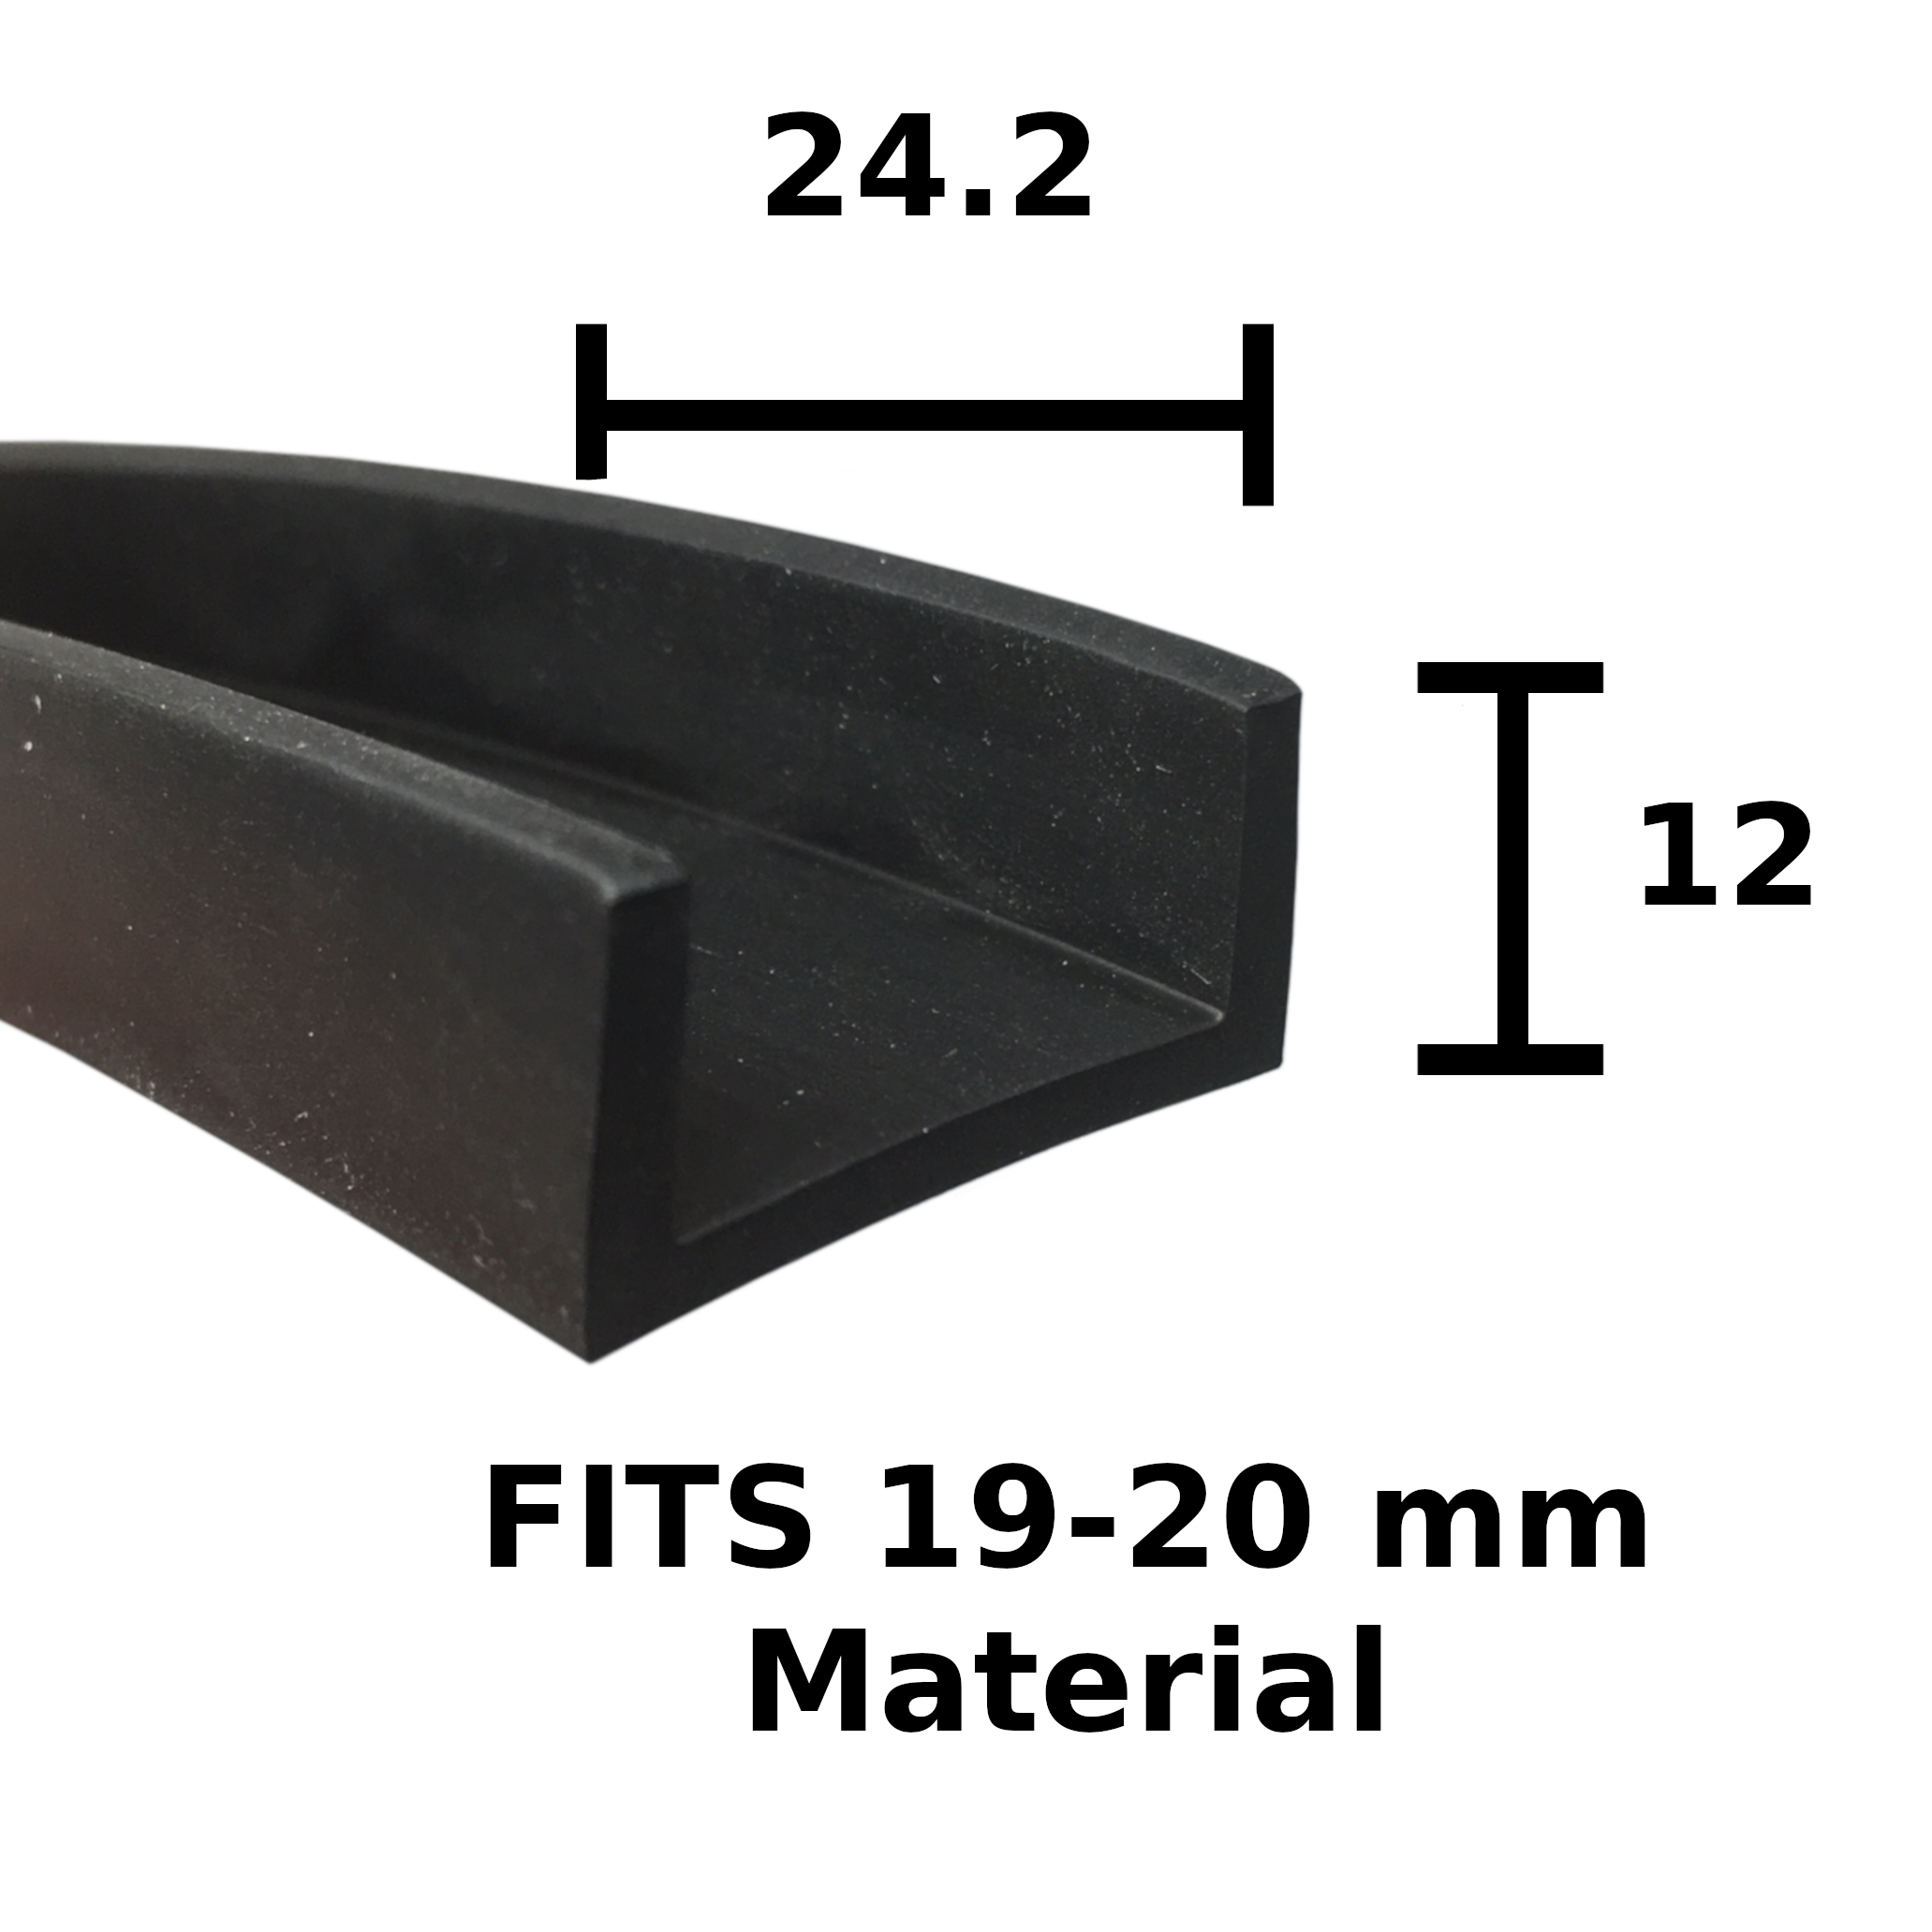 U channel edge trim